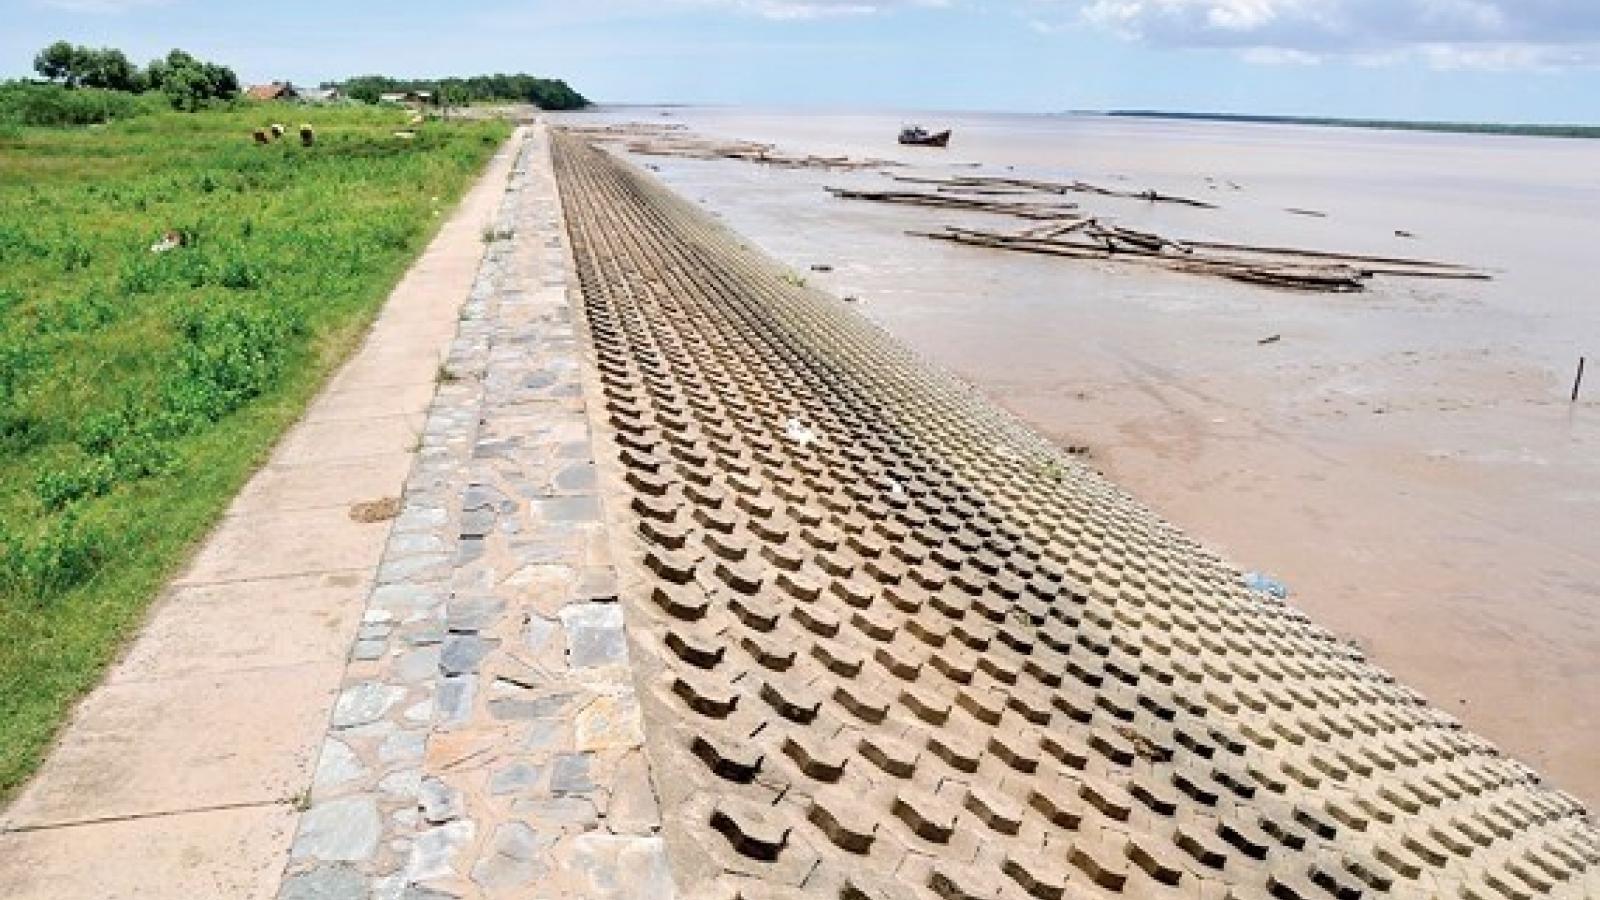 HCM City's sea dyke aims to stop waterlogging